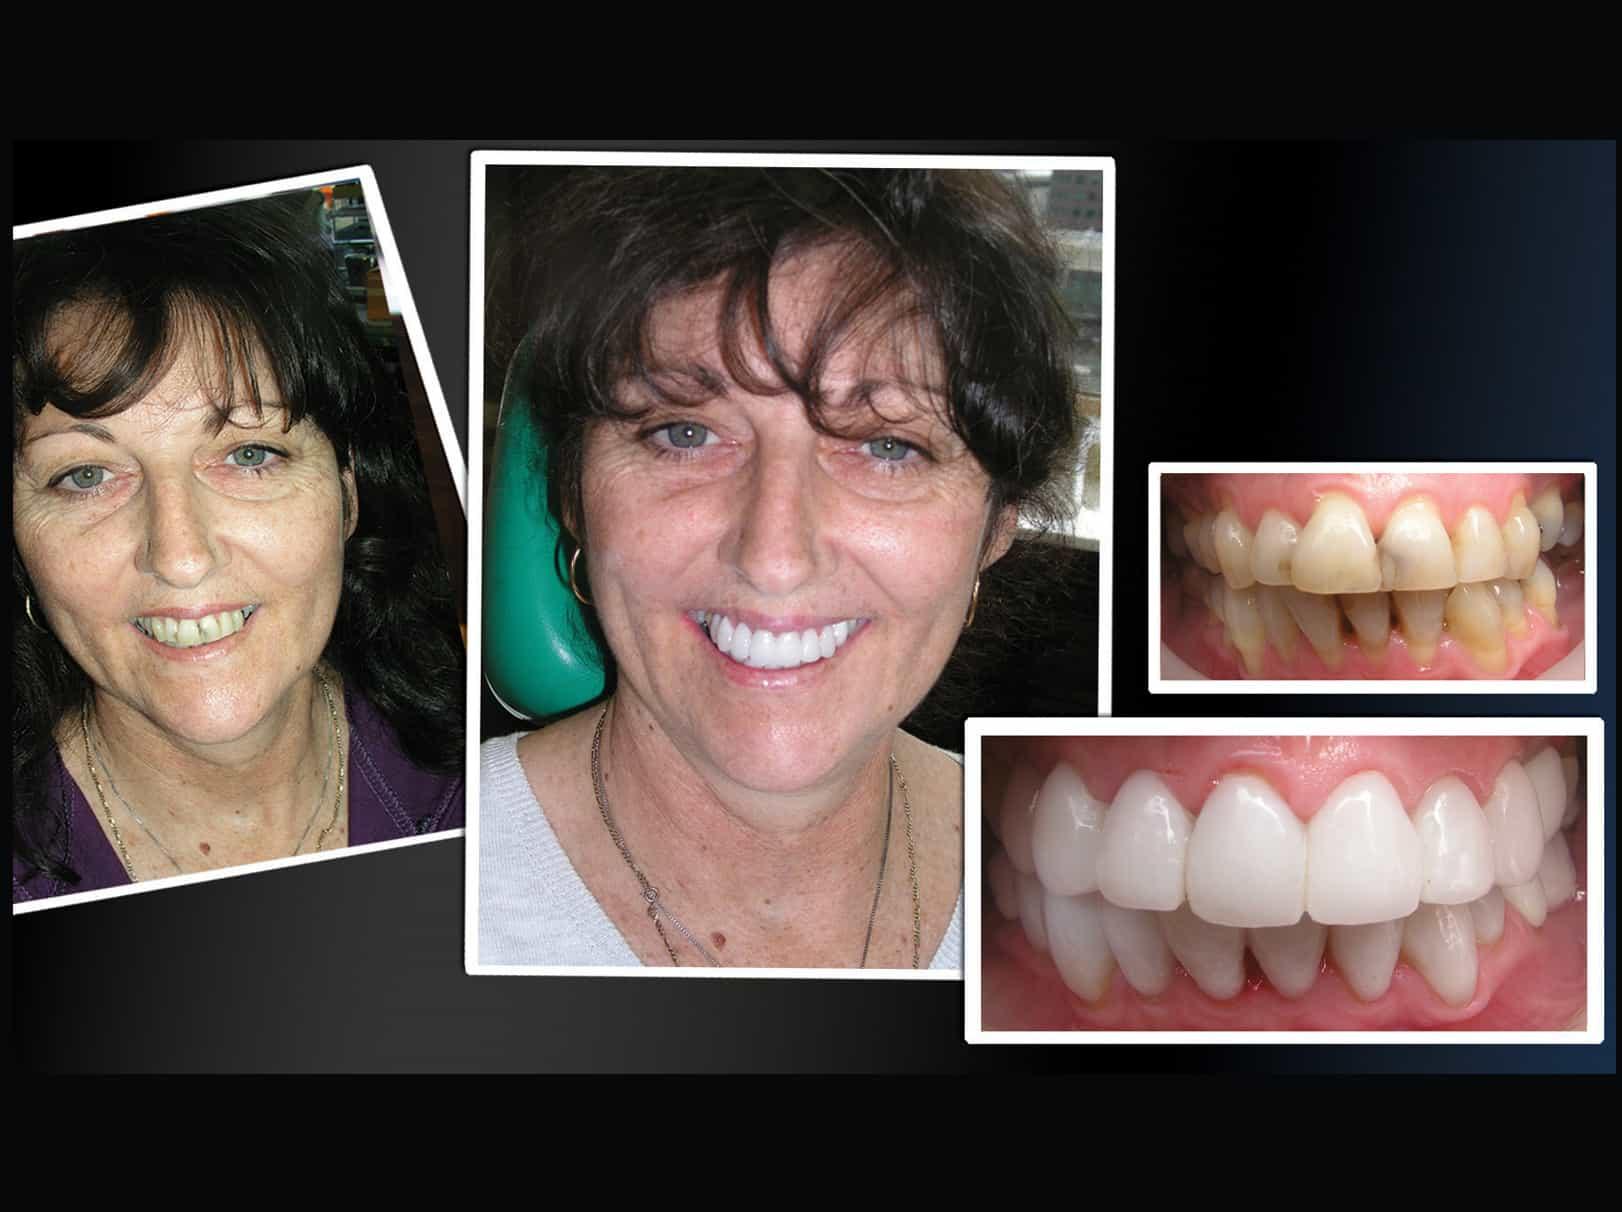 Permanent Teeth Whitening Treatment With Porcelain Veneers